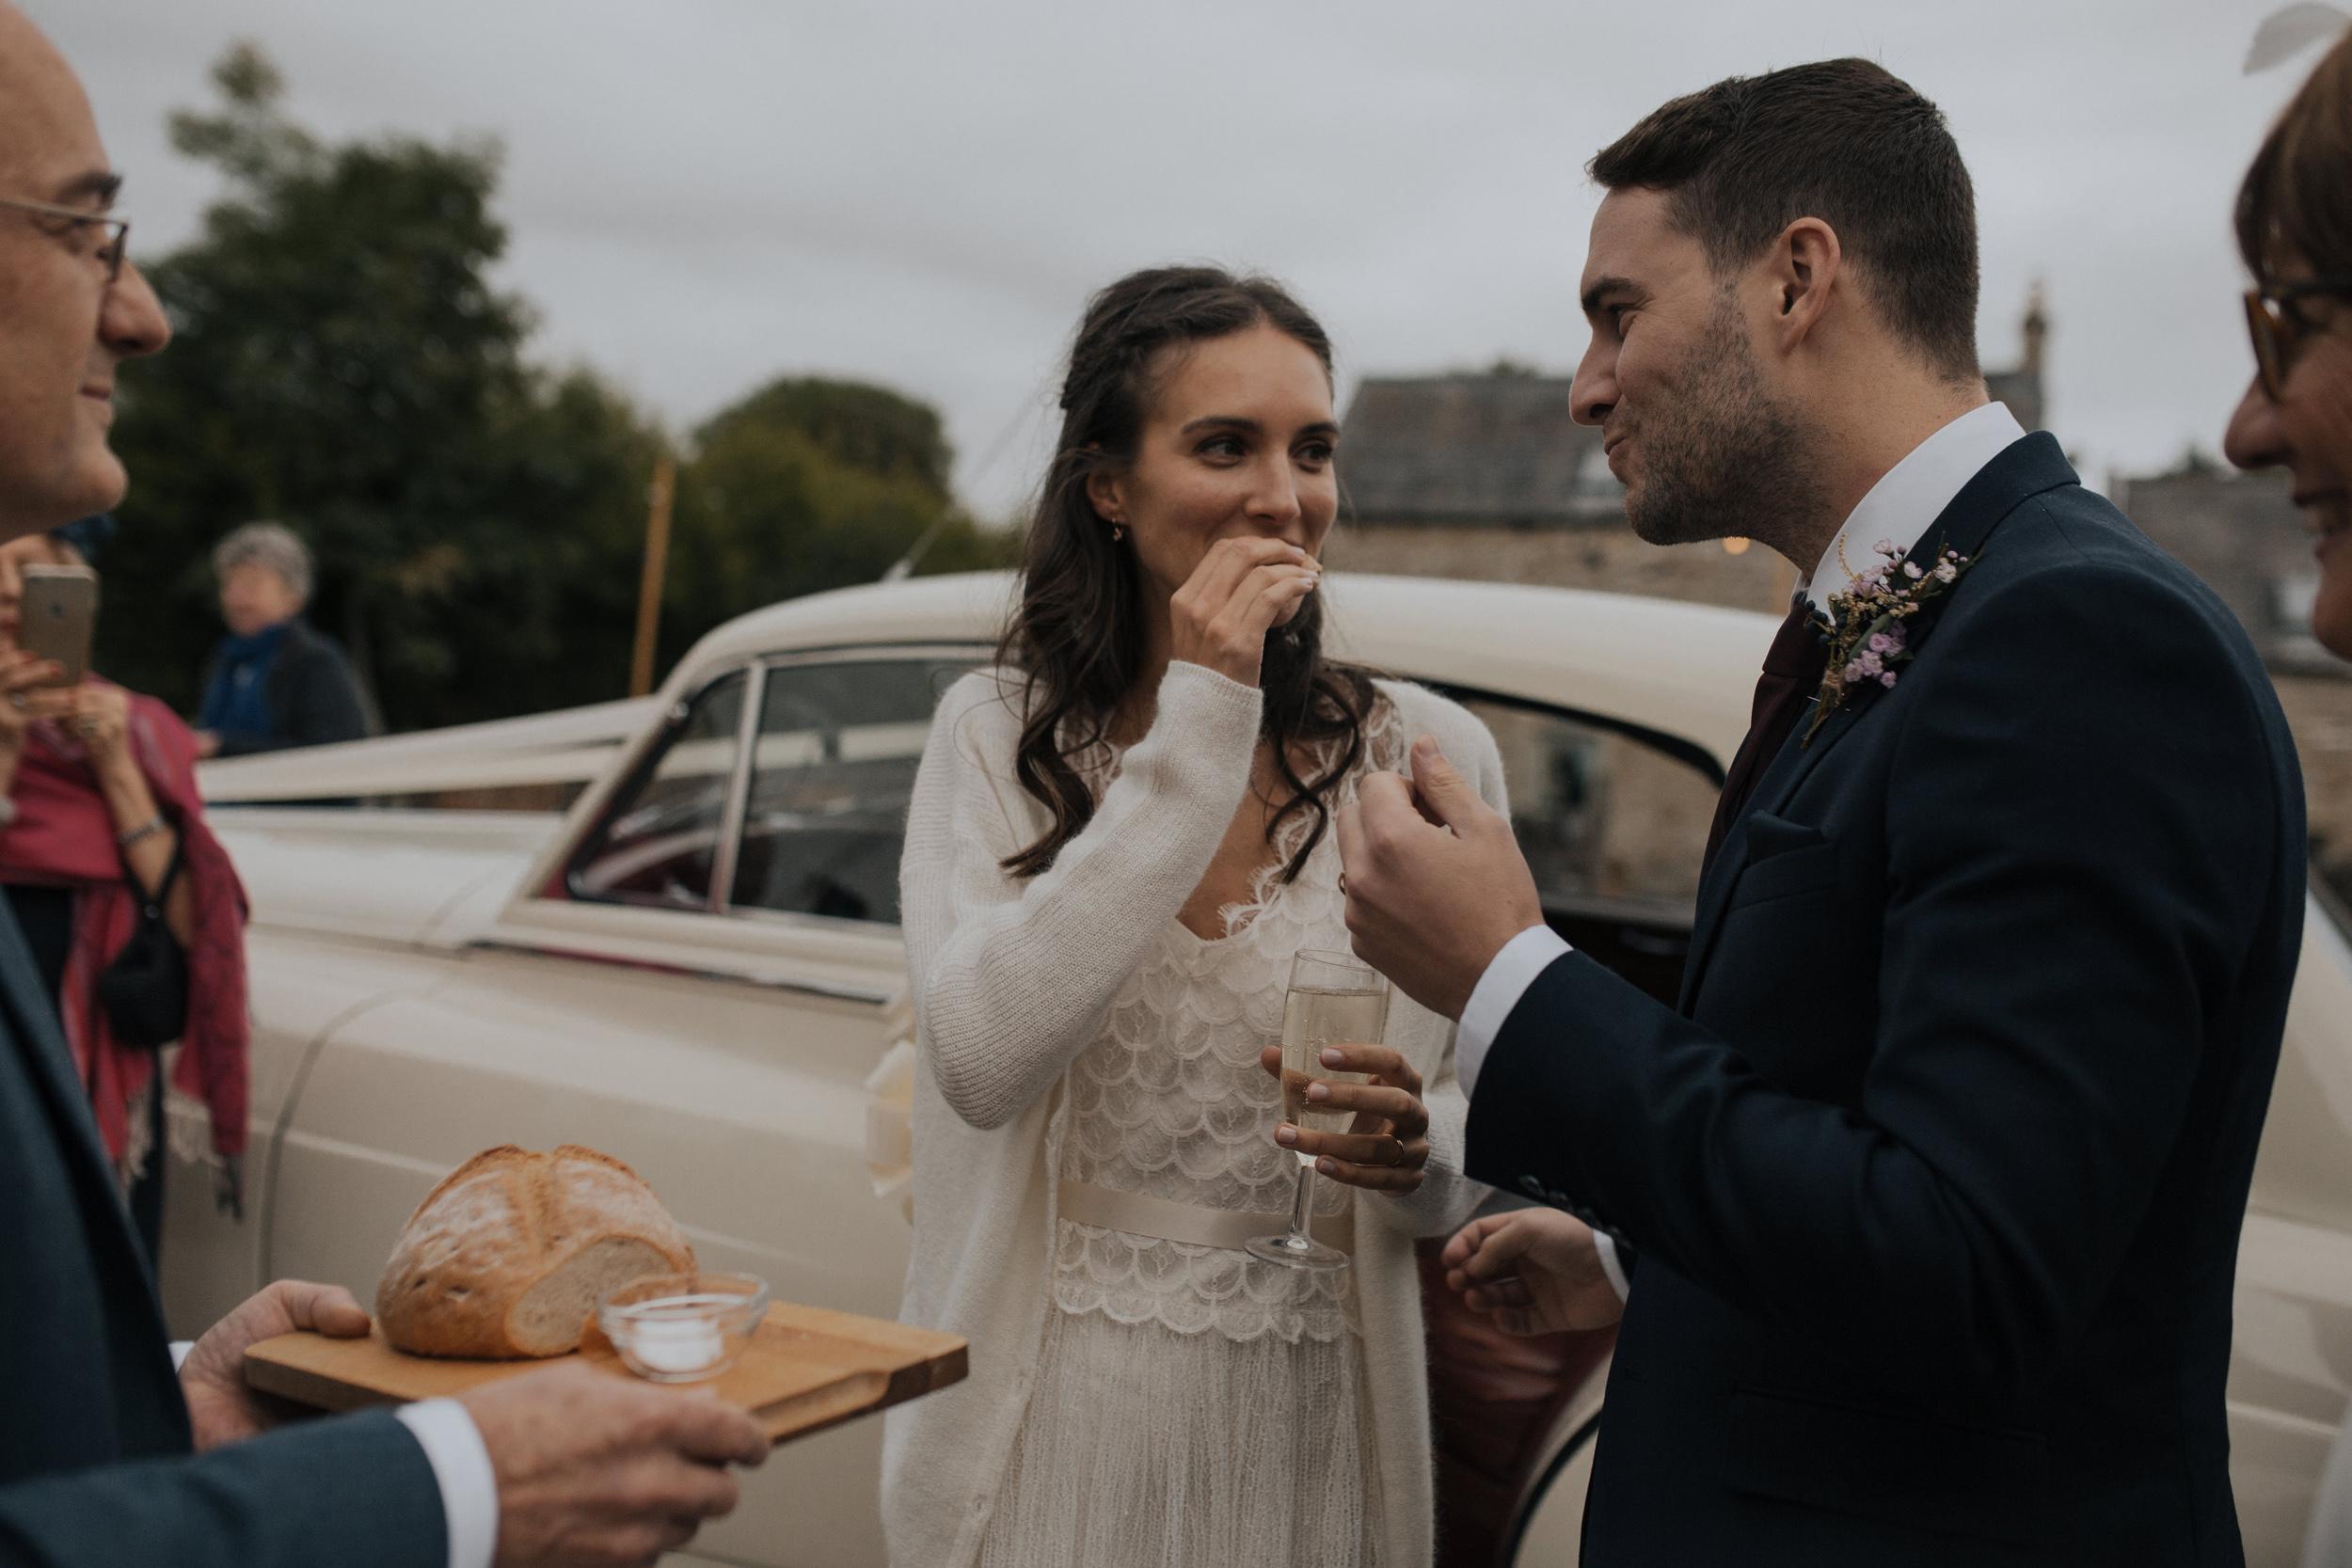 Joasia-Kate-Beaumont-Bohemian-Lace-Wedding-Dress-Peak-District-Sheffield-Wedding-45.jpg